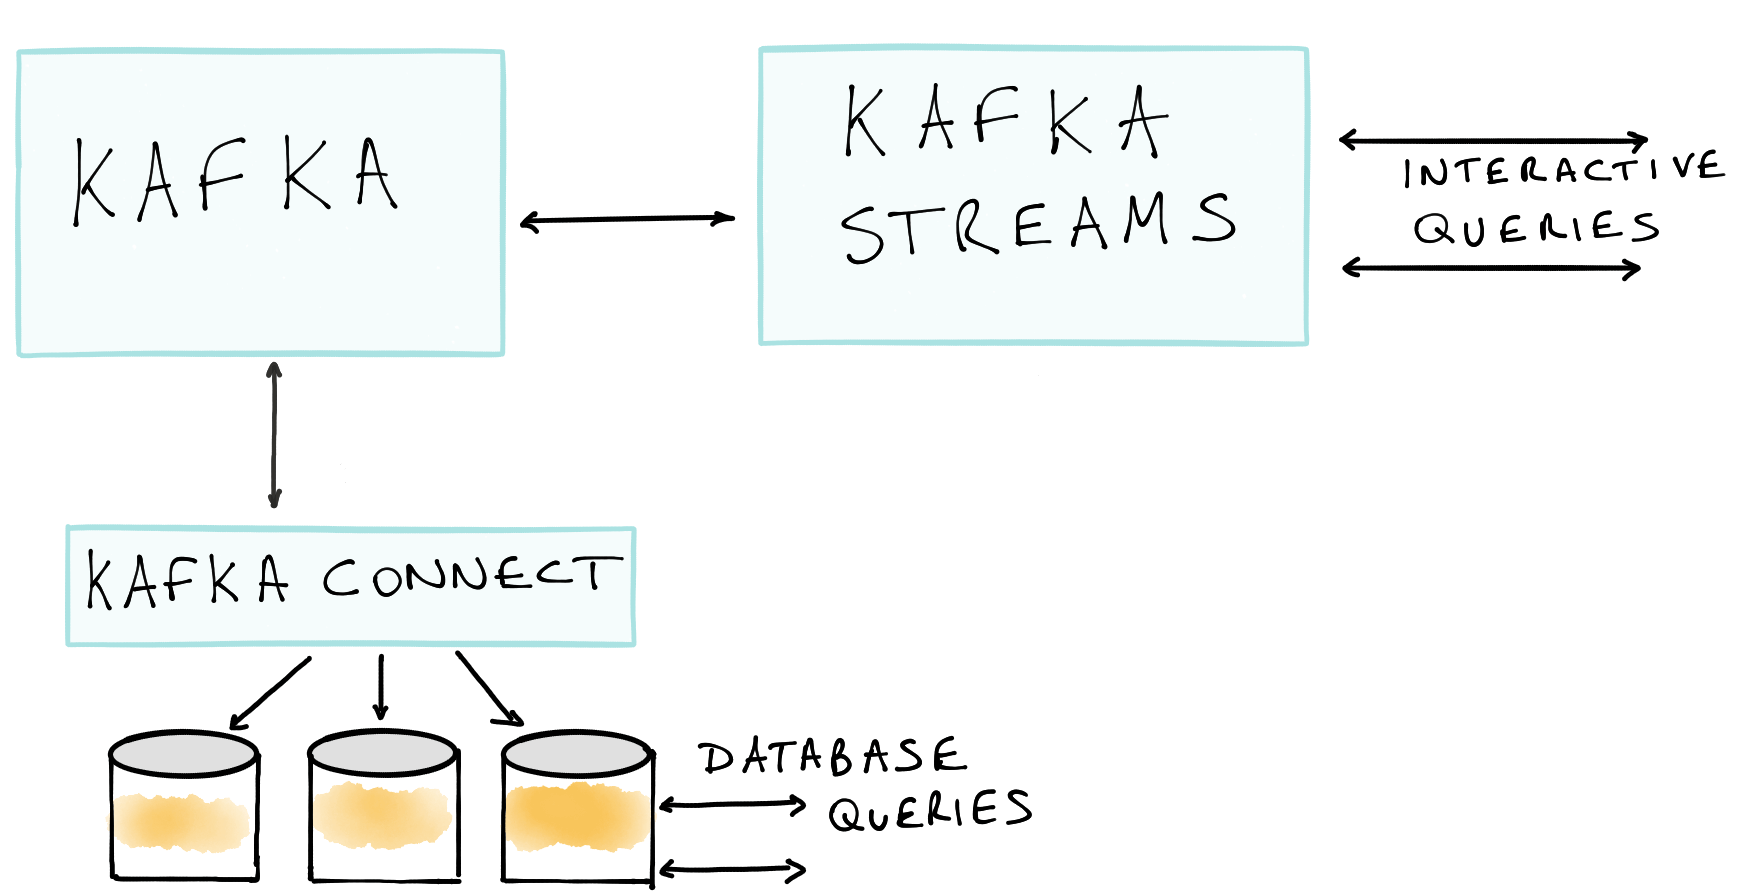 iqueries-blog-diagrams-5-1